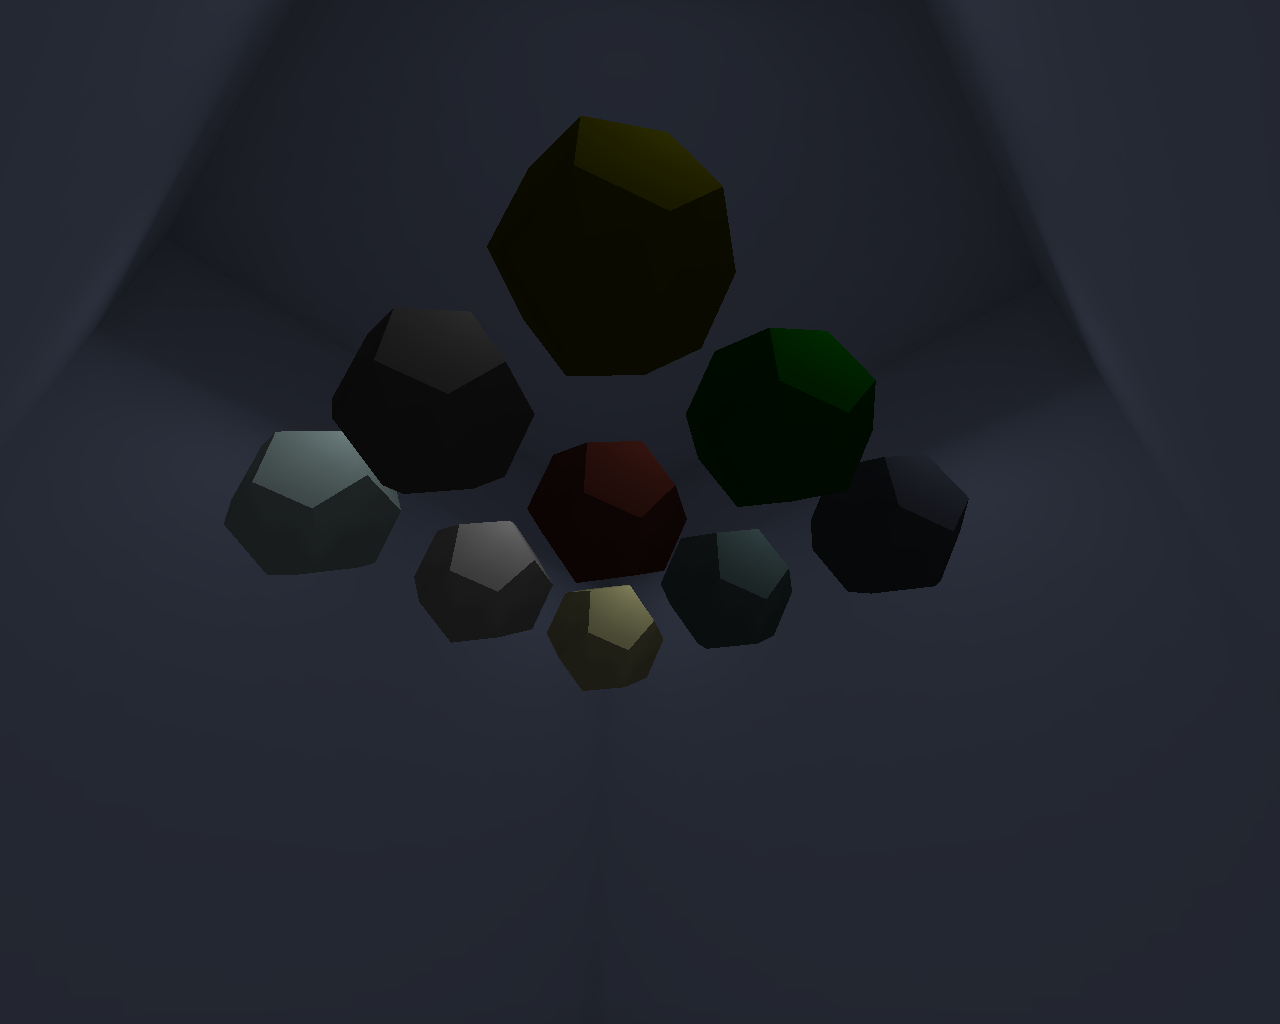 ln_cube0004.png - Half-Life ln_cube, додэкаэдр